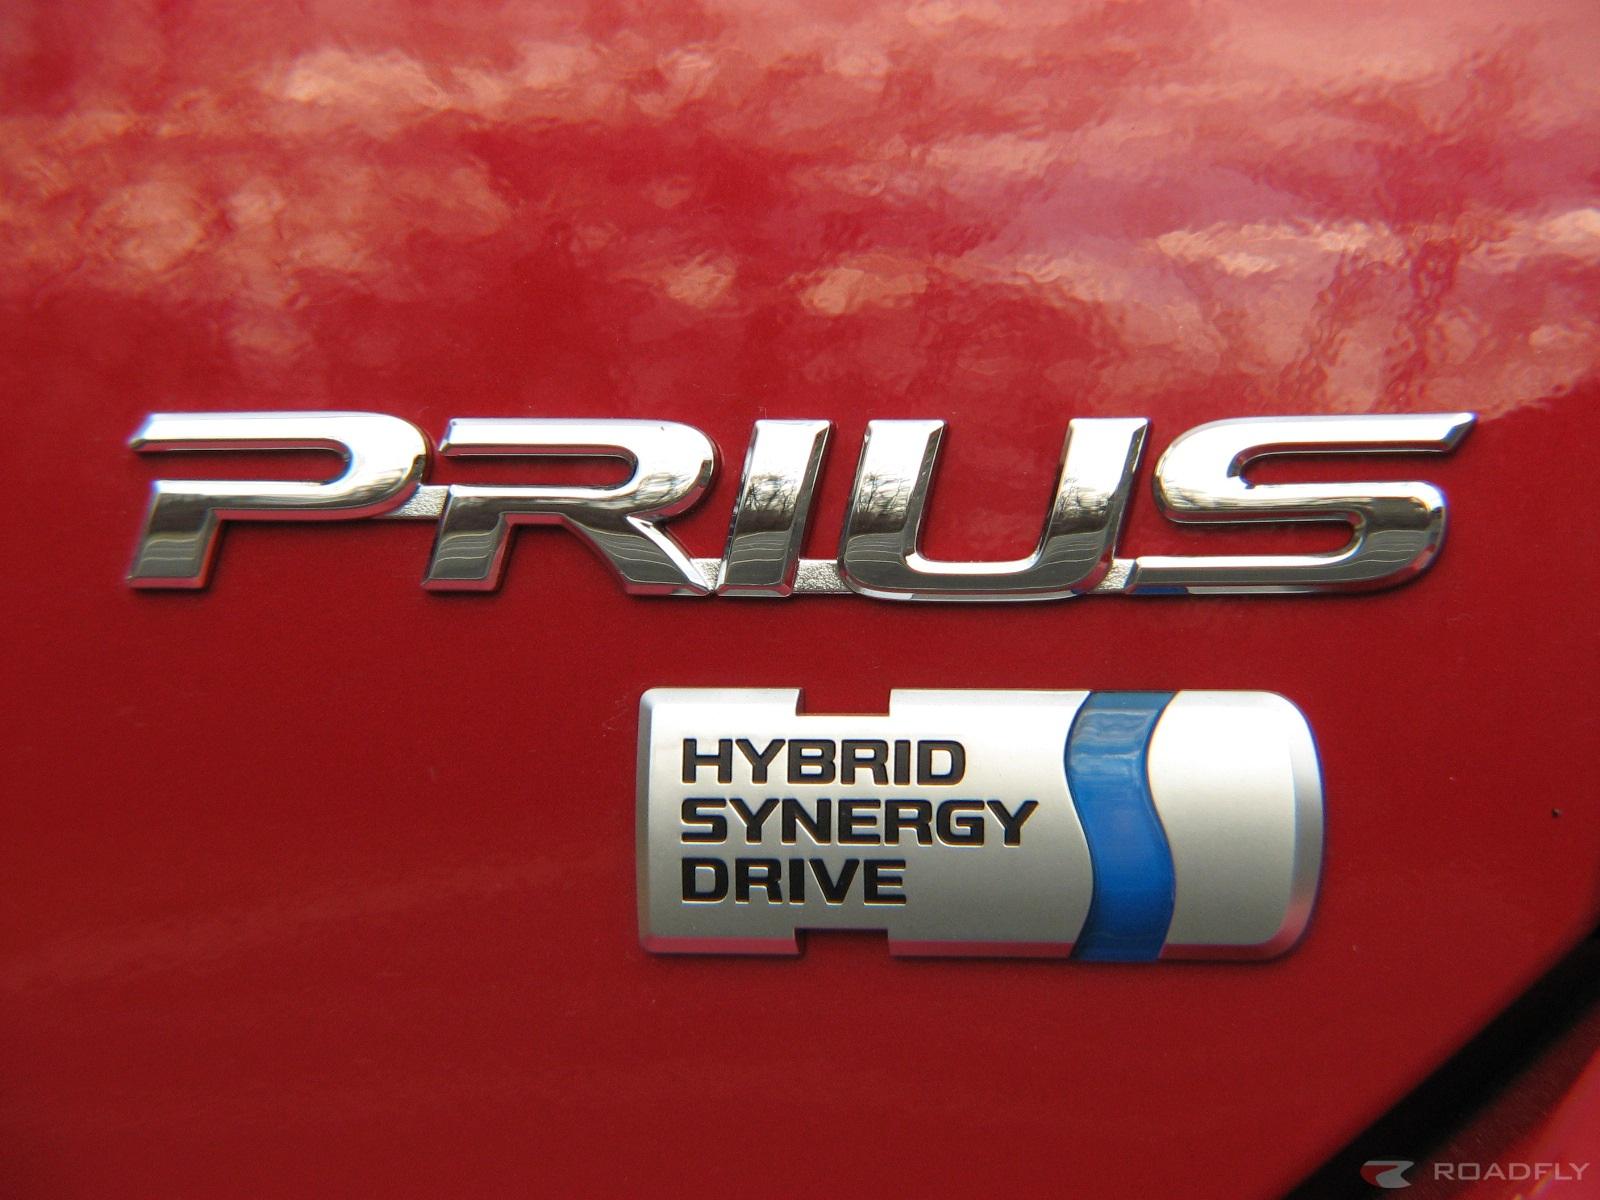 Especial: Autos hibridos